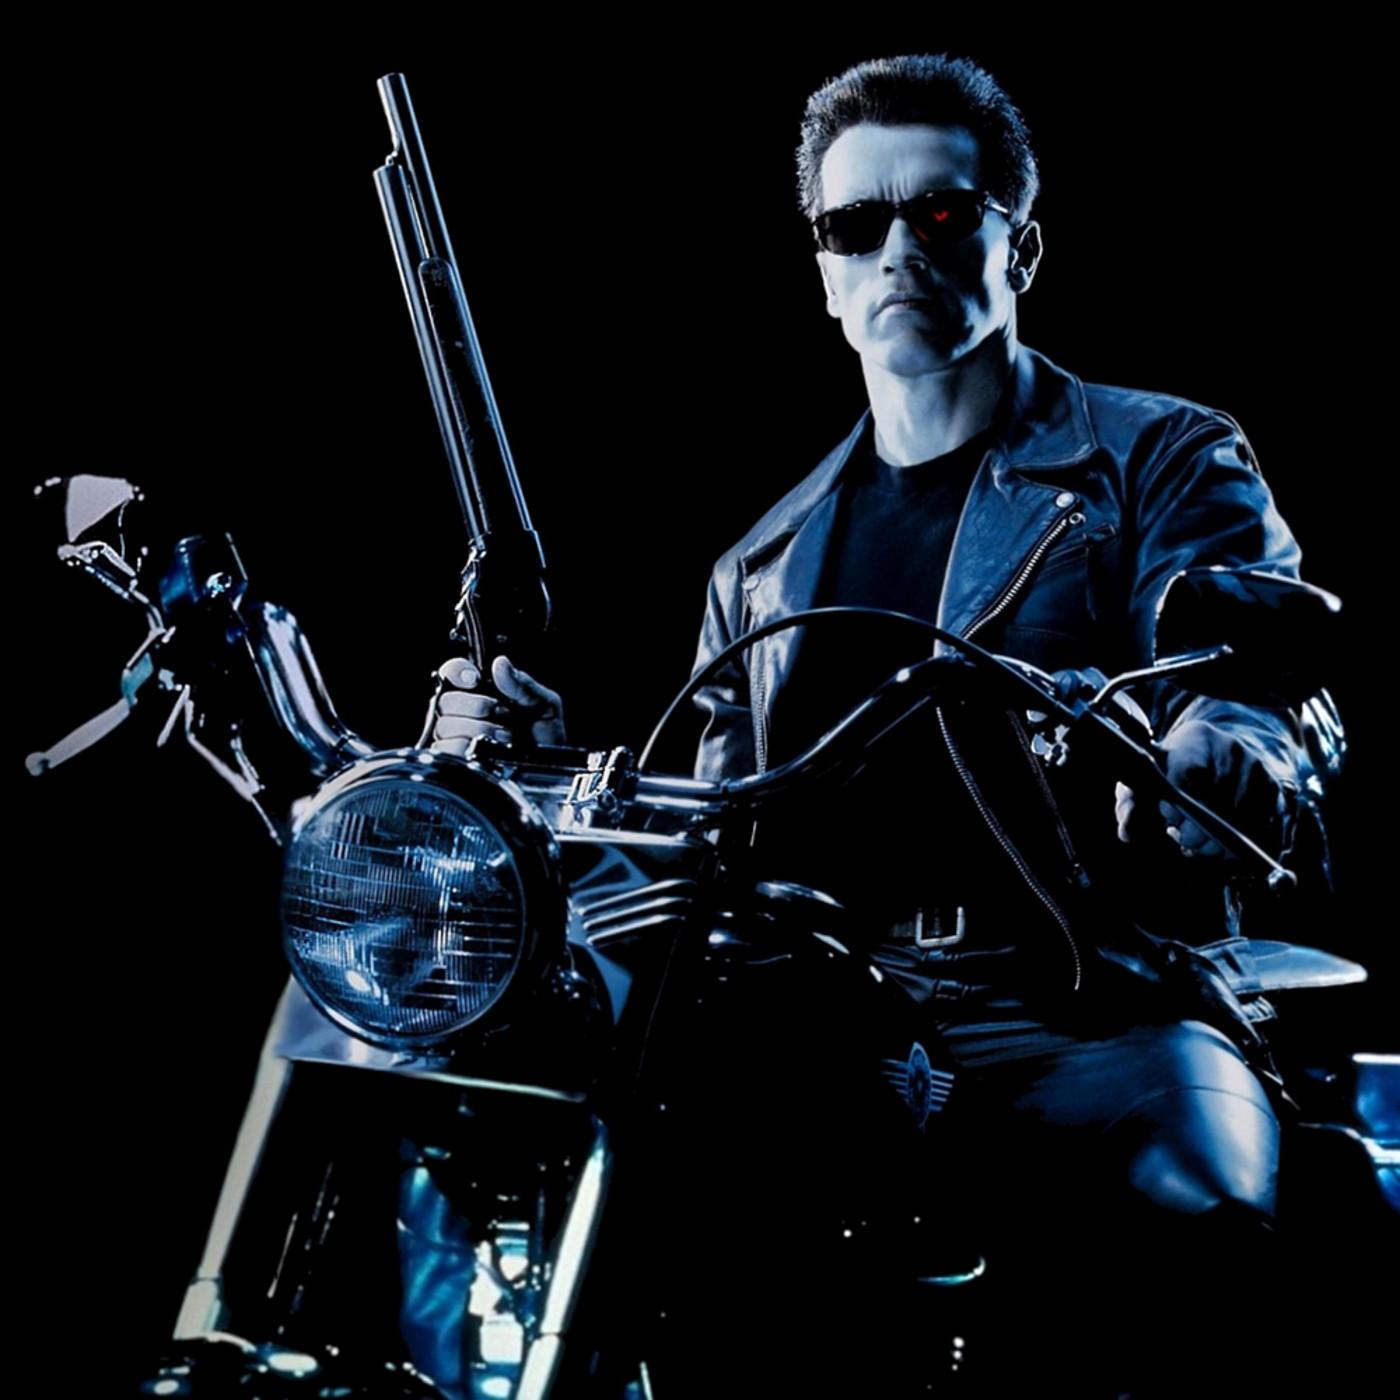 Terminator movie poster linen backed